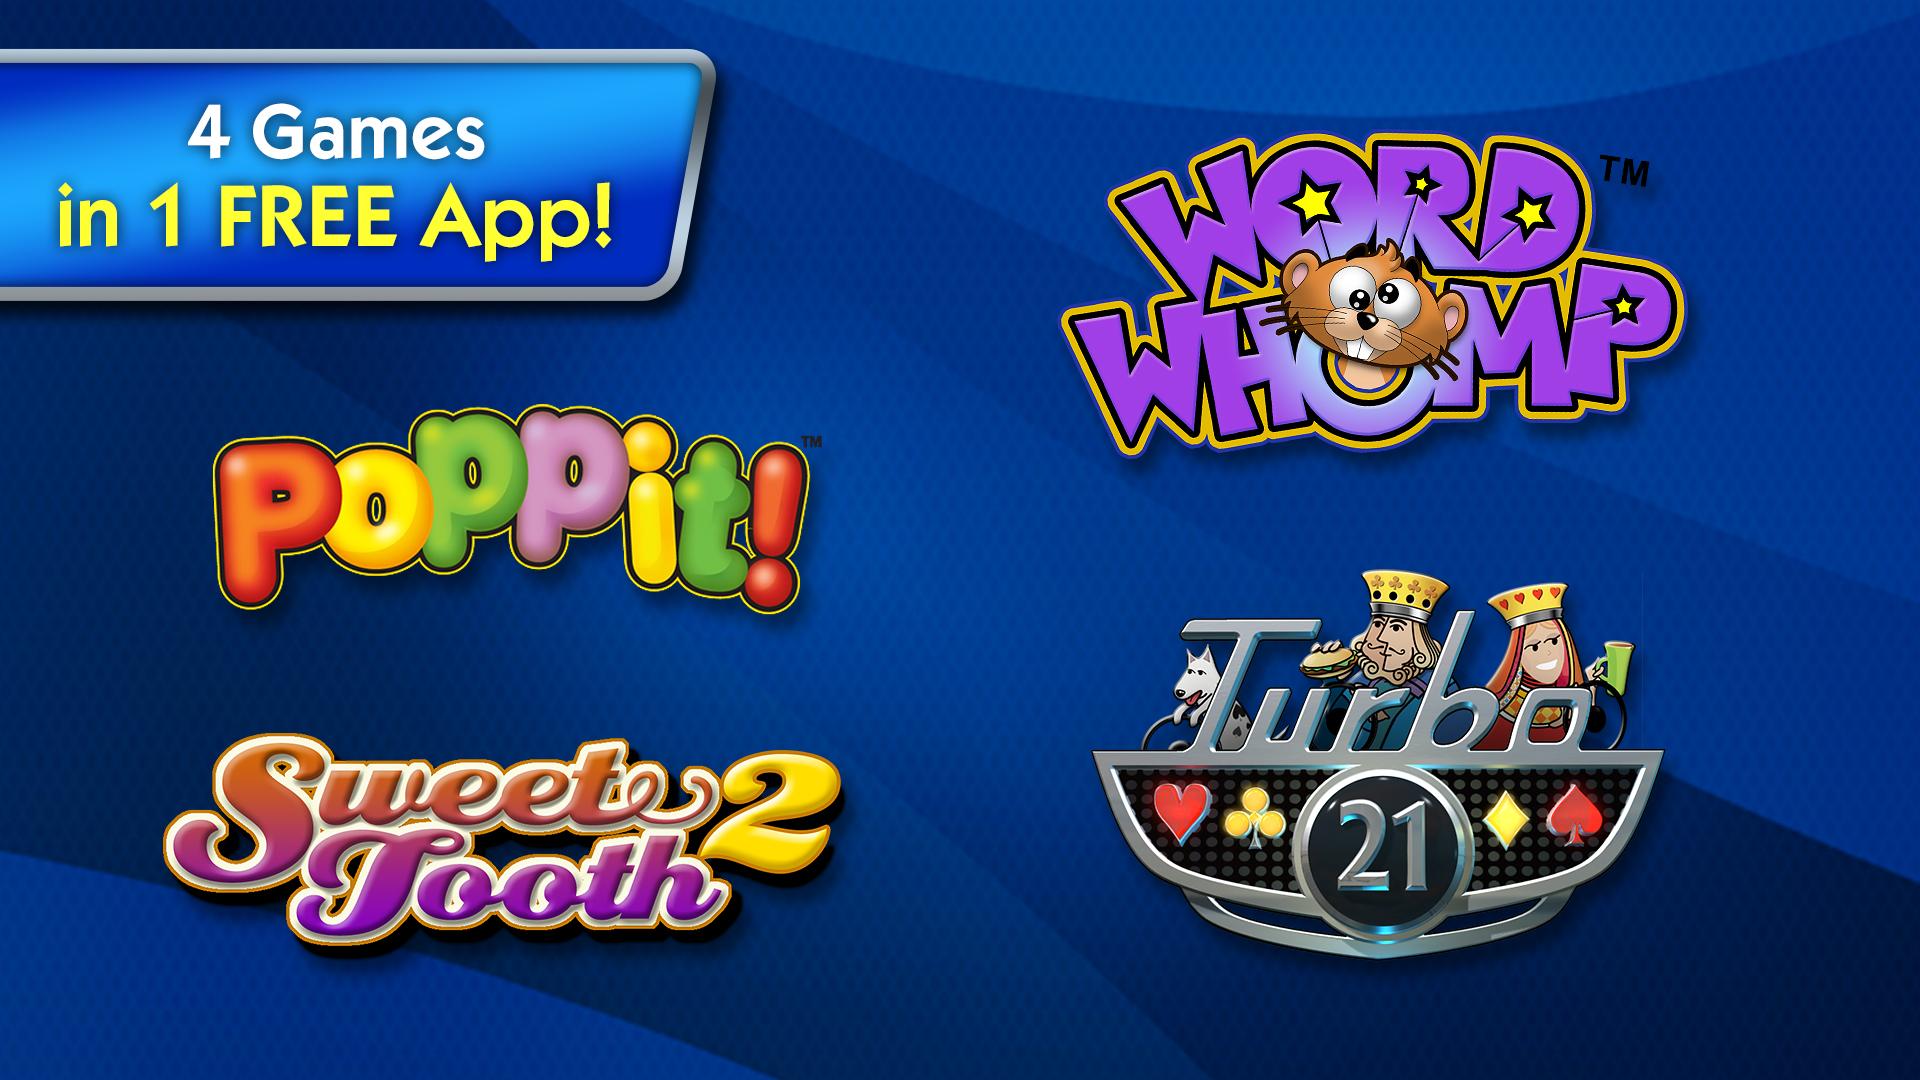 Amazoncom apps games - Amazoncom Apps Games 14